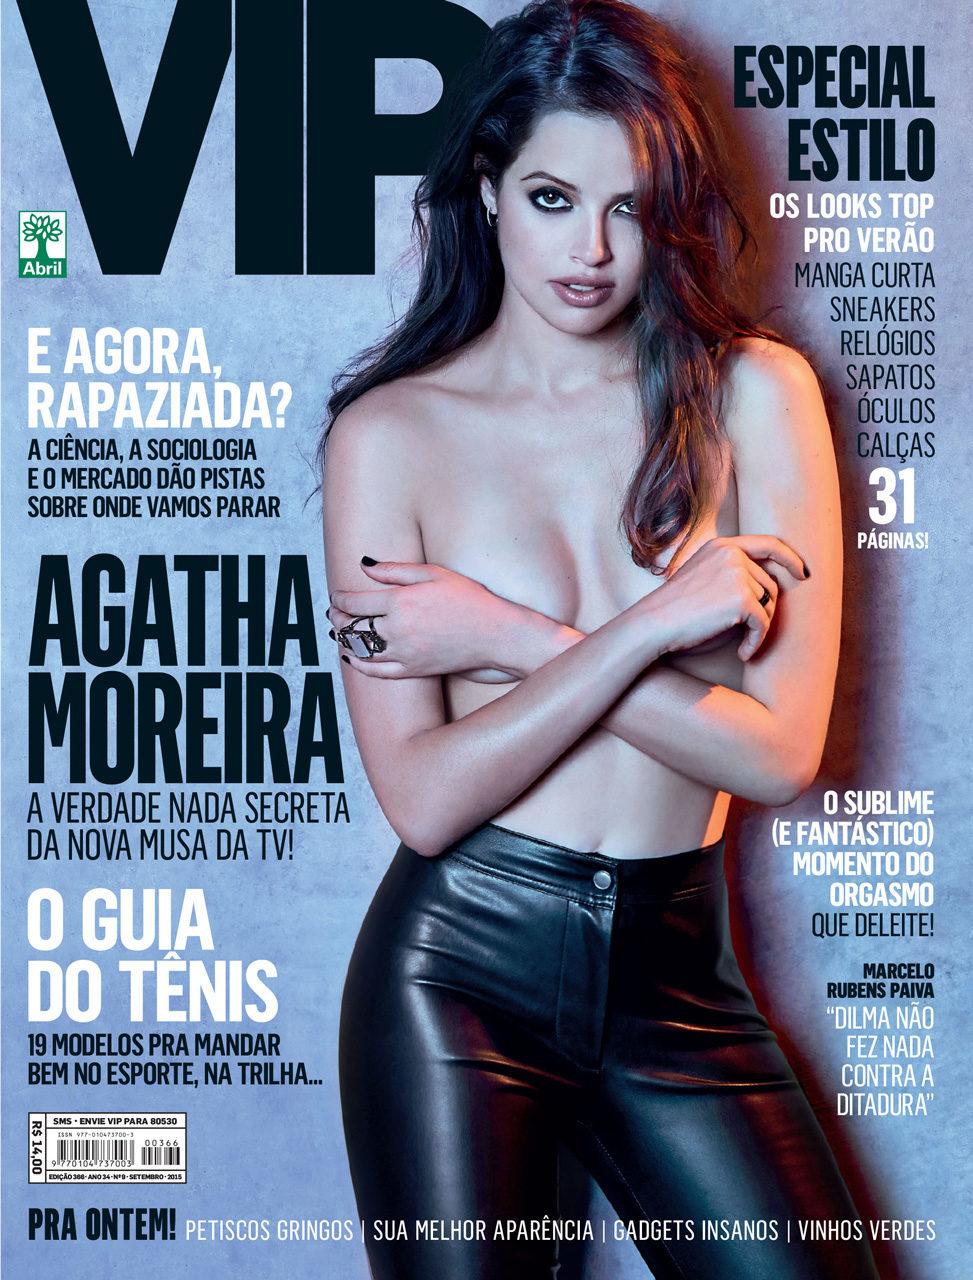 VIP366-Capa_Agatha-Moreira-973x1280